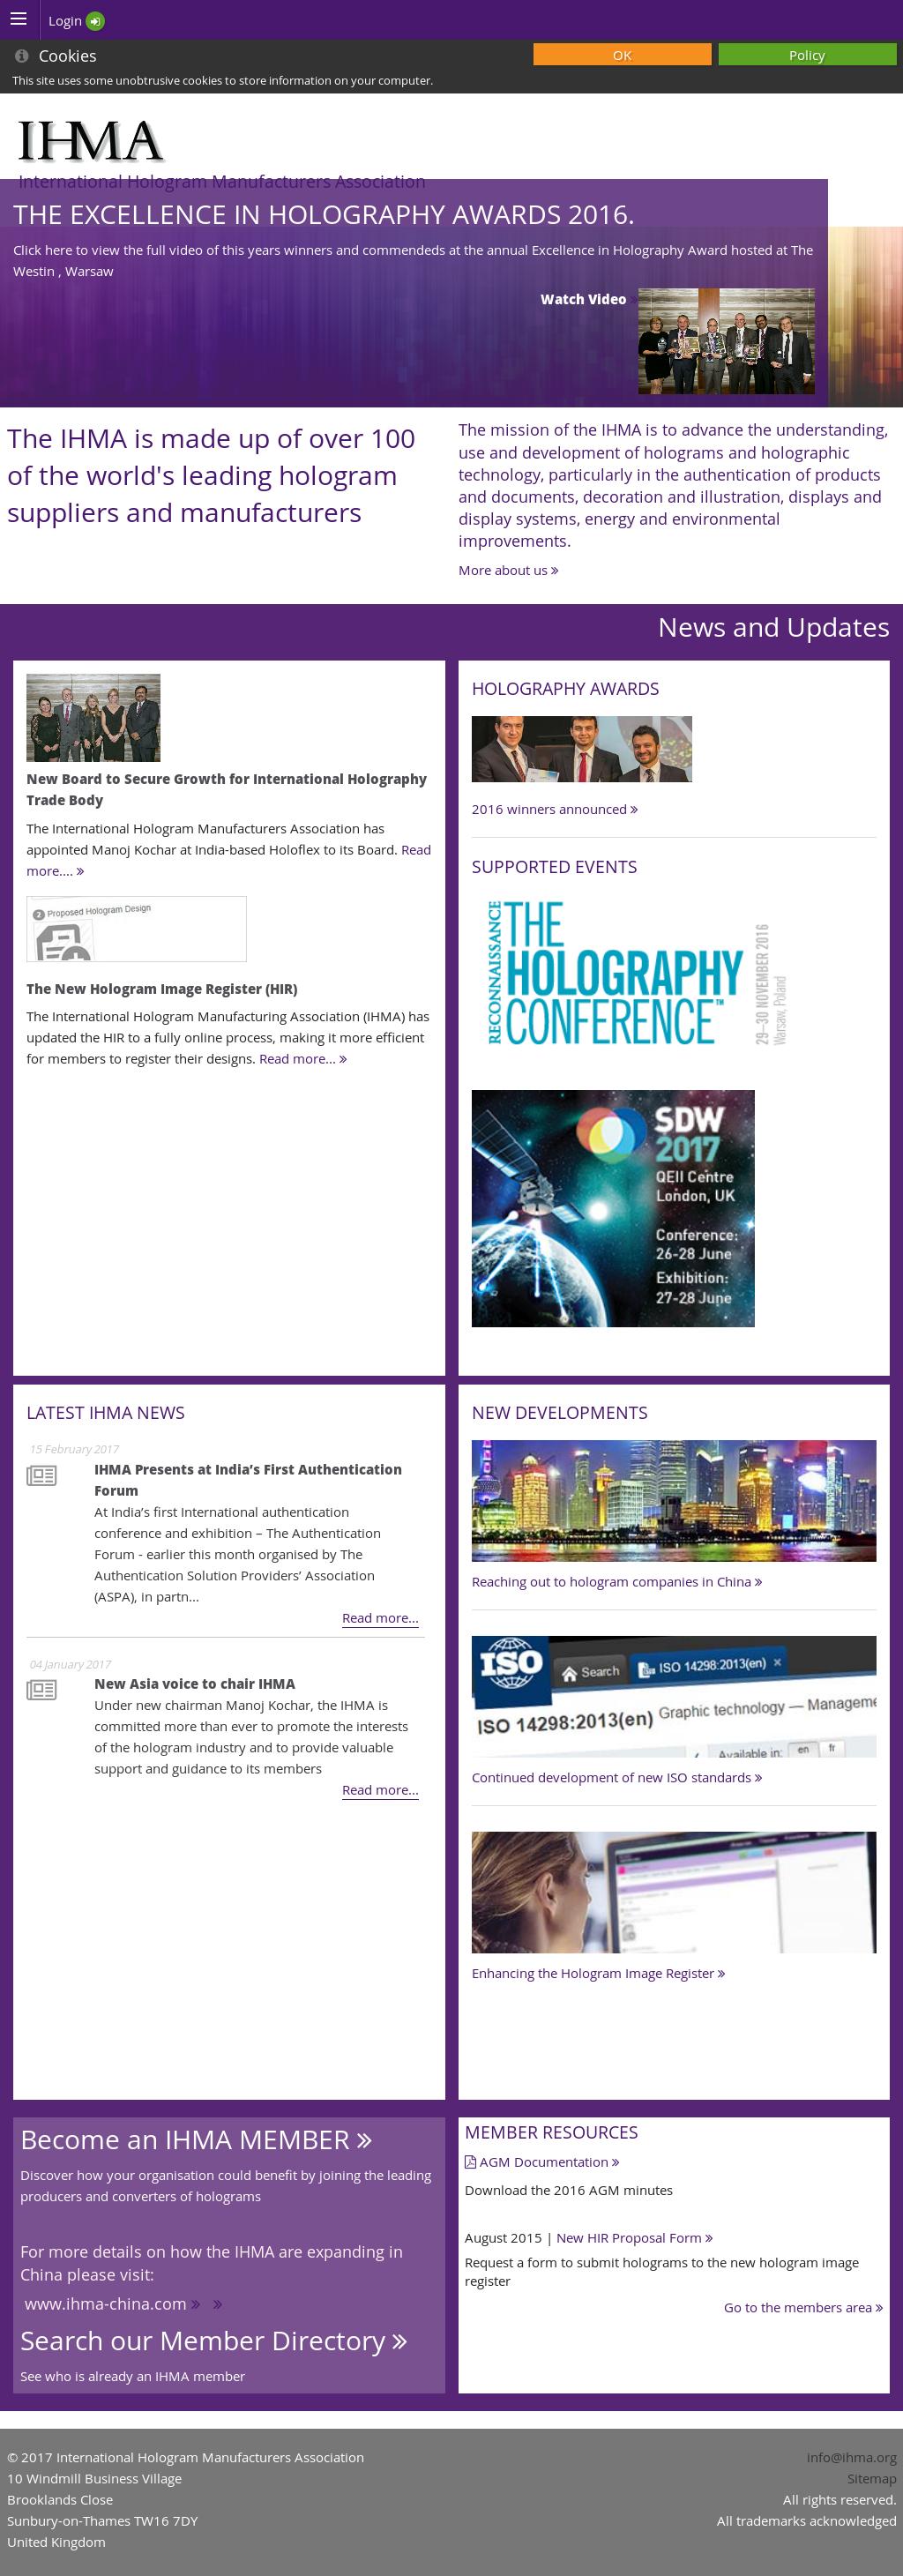 Ihma Competitors, Revenue and Employees - Owler Company Profile